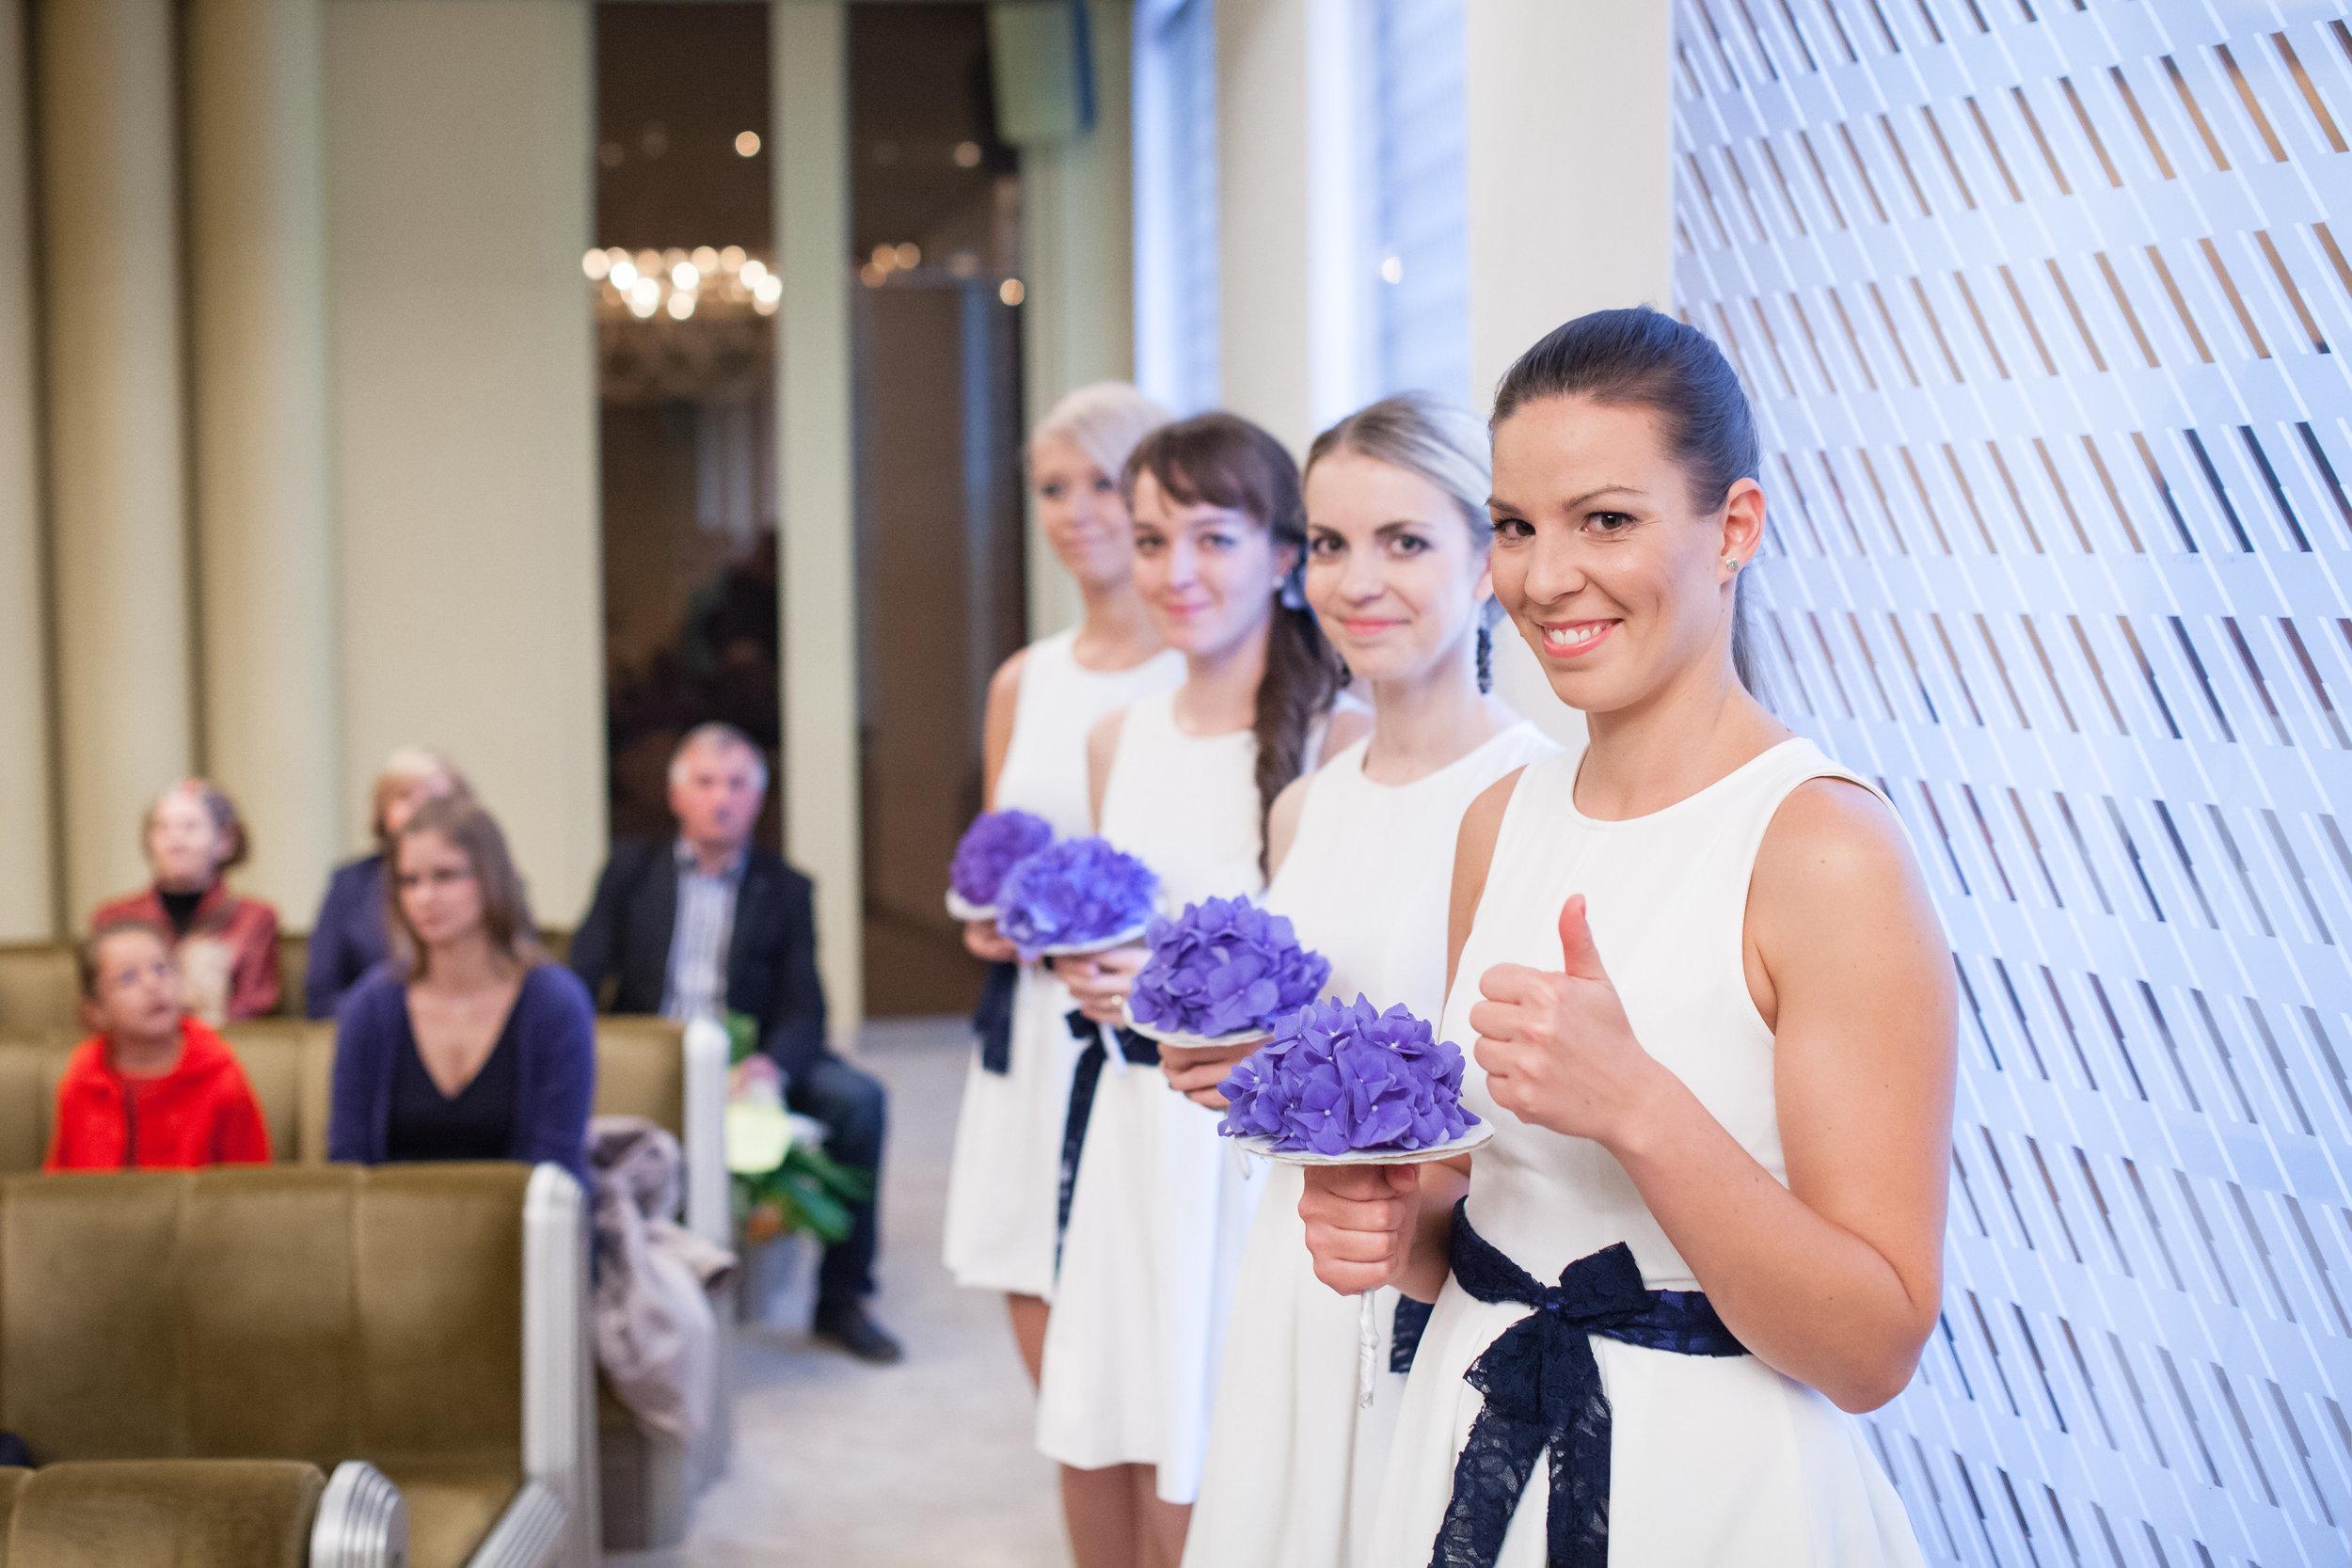 destination-wedding-photographer-bratislava-slovakia-europe-ceremony-documentary-2.jpg